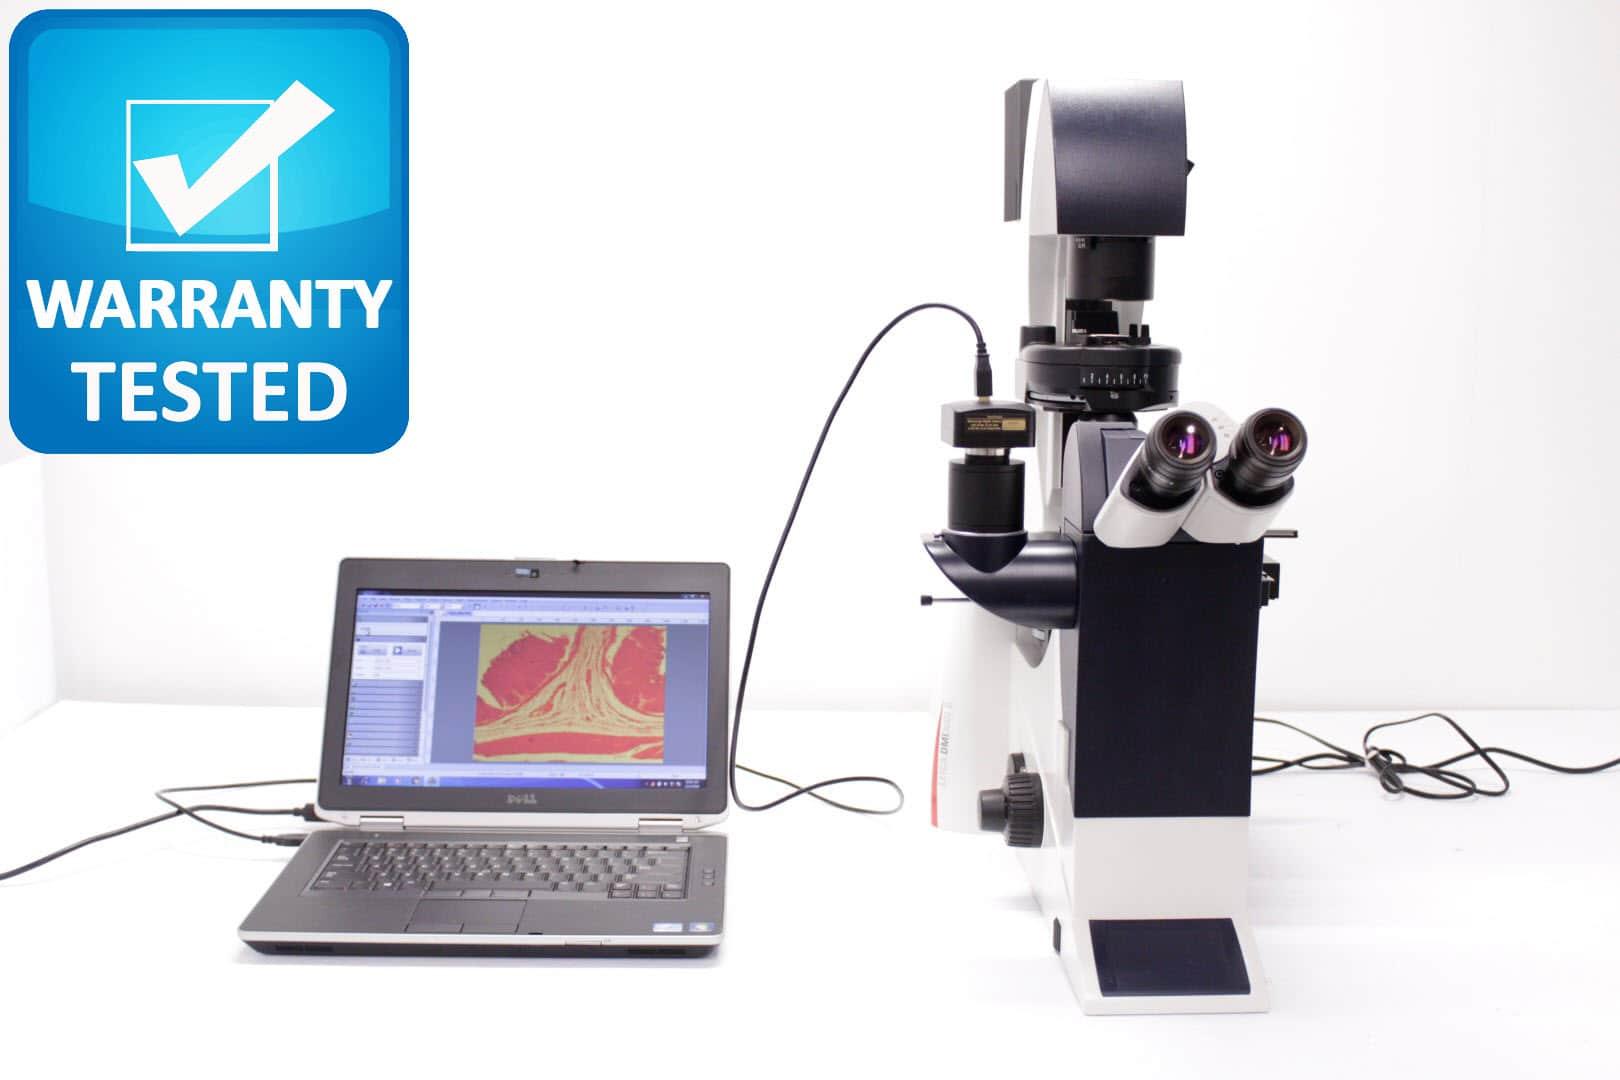 Leica DMI3000 B Inverted Microscope